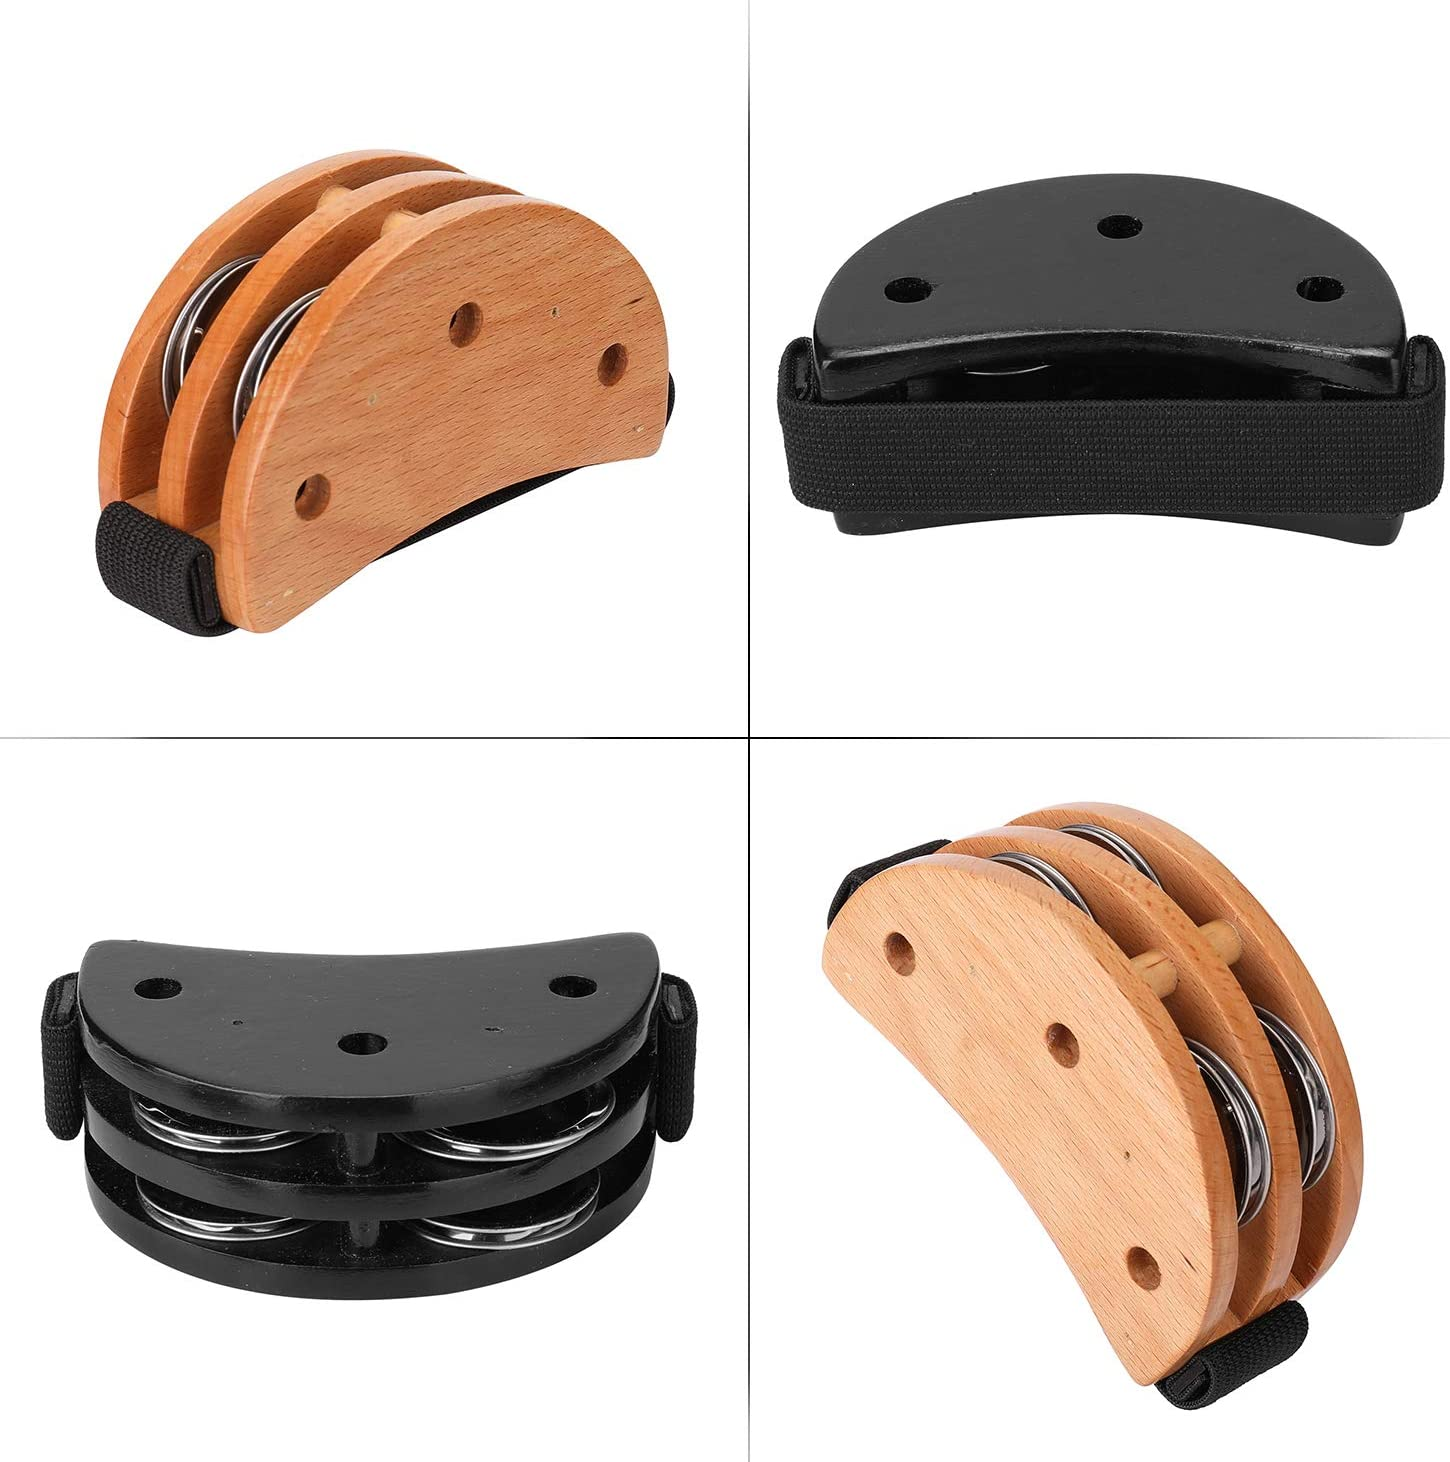 Extaum Pied Tambourin,Pied Tambourin Black Drum Companion Jingle Tambourine Instrument de Percussion Accessoire L/éger Main Pied Tambourin /à double usage